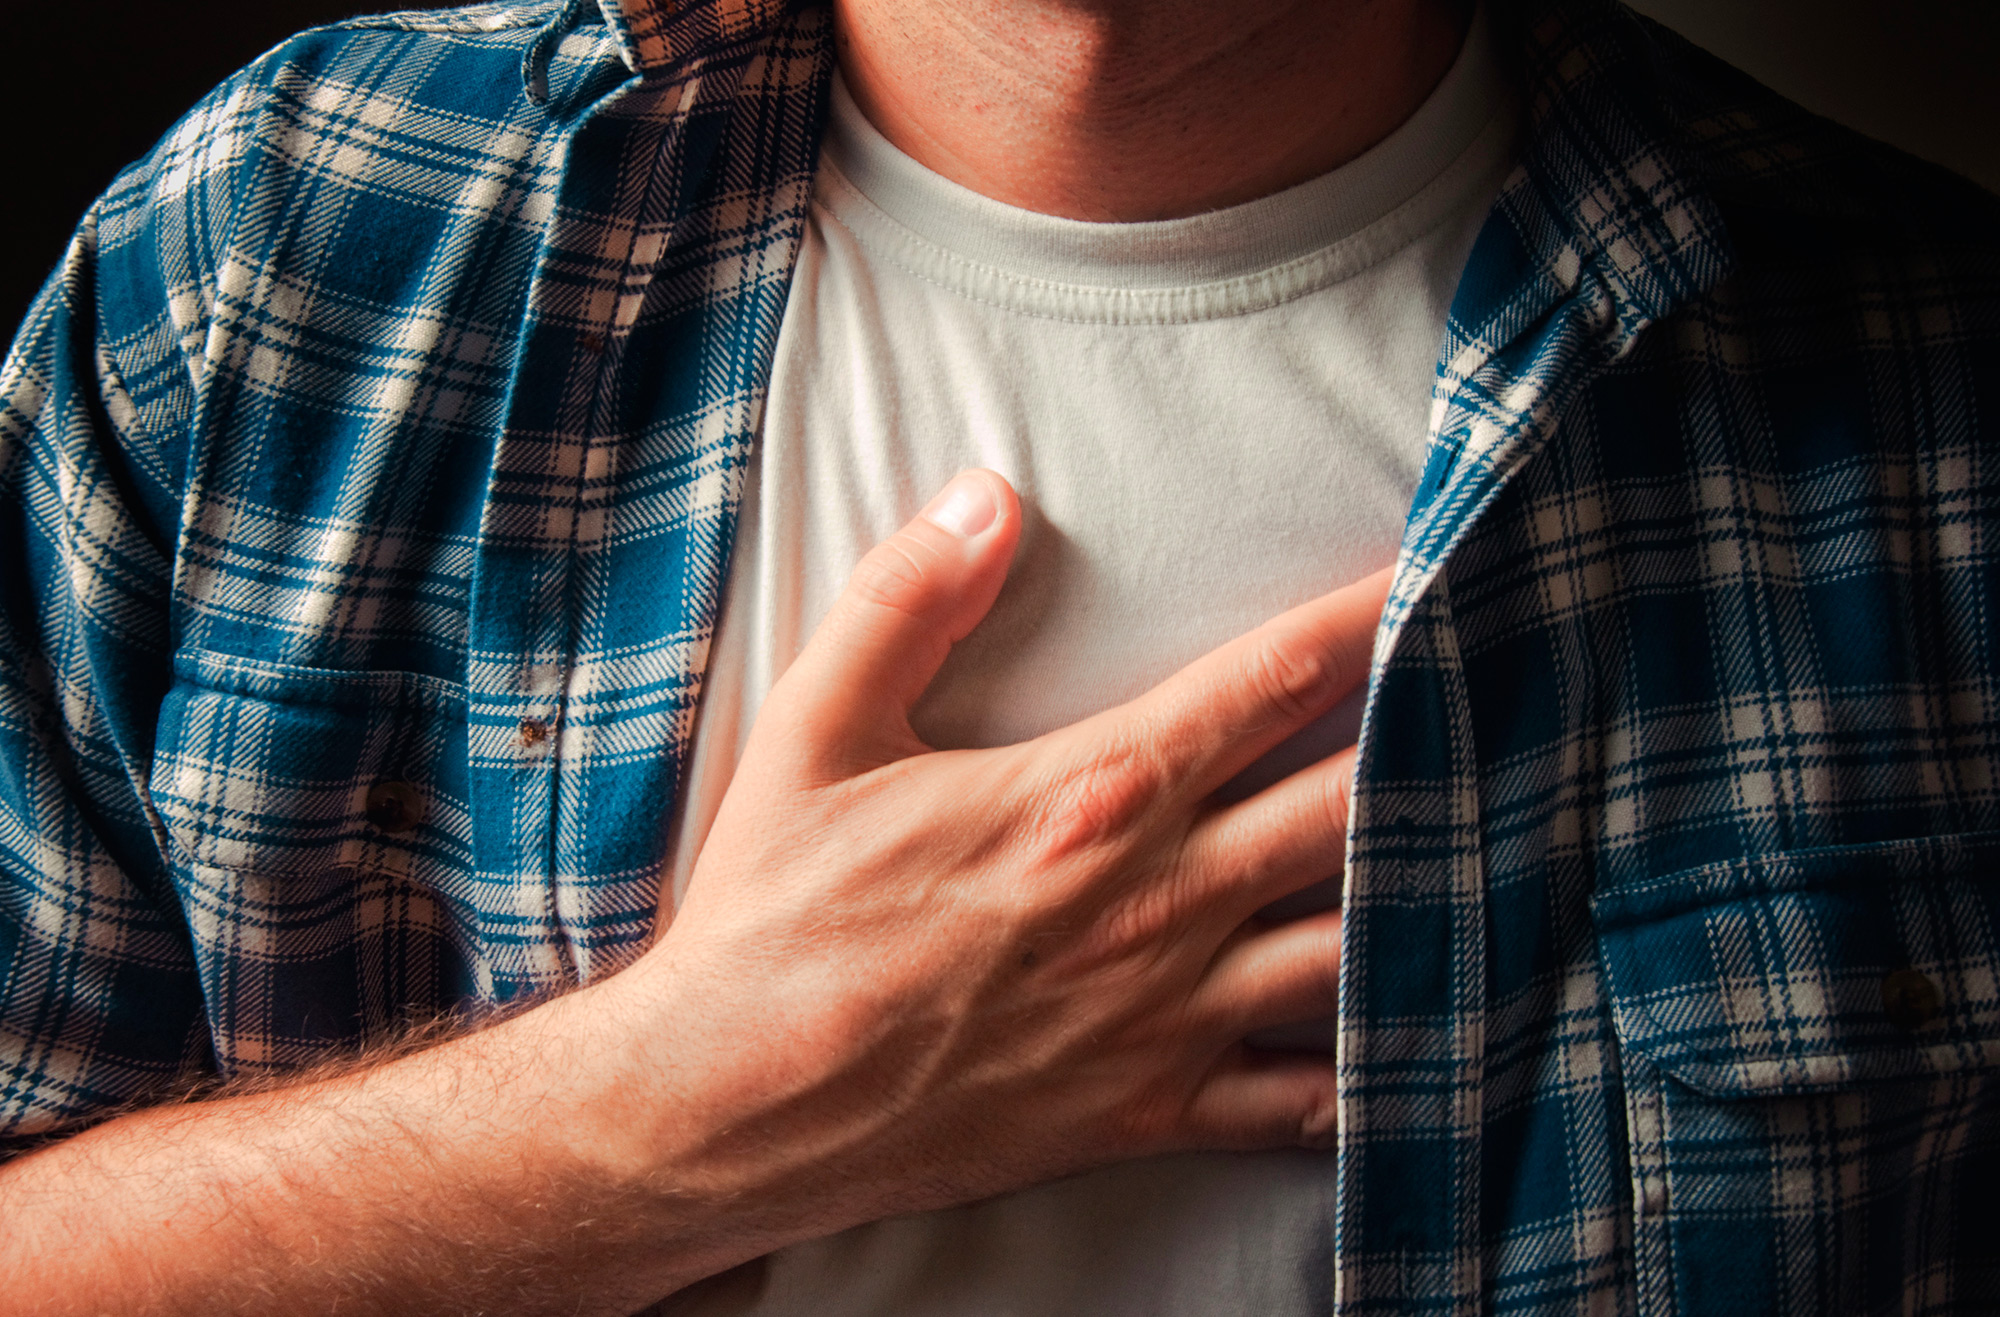 skauda krutine tirpsta ranka